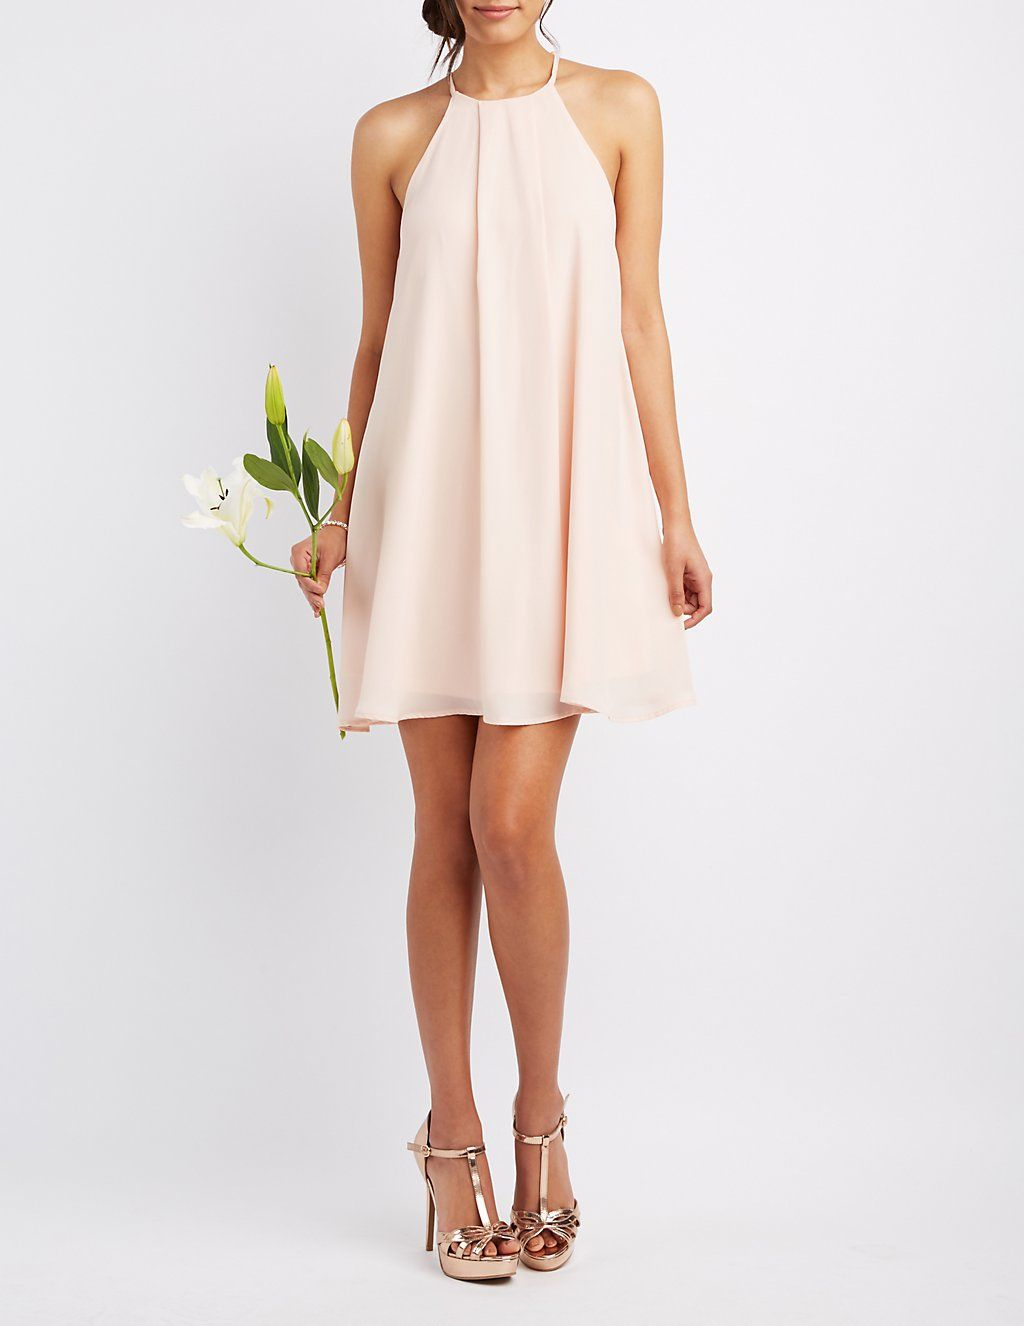 Bib Neck Shift Dress in Fashion Pinterest Dresses